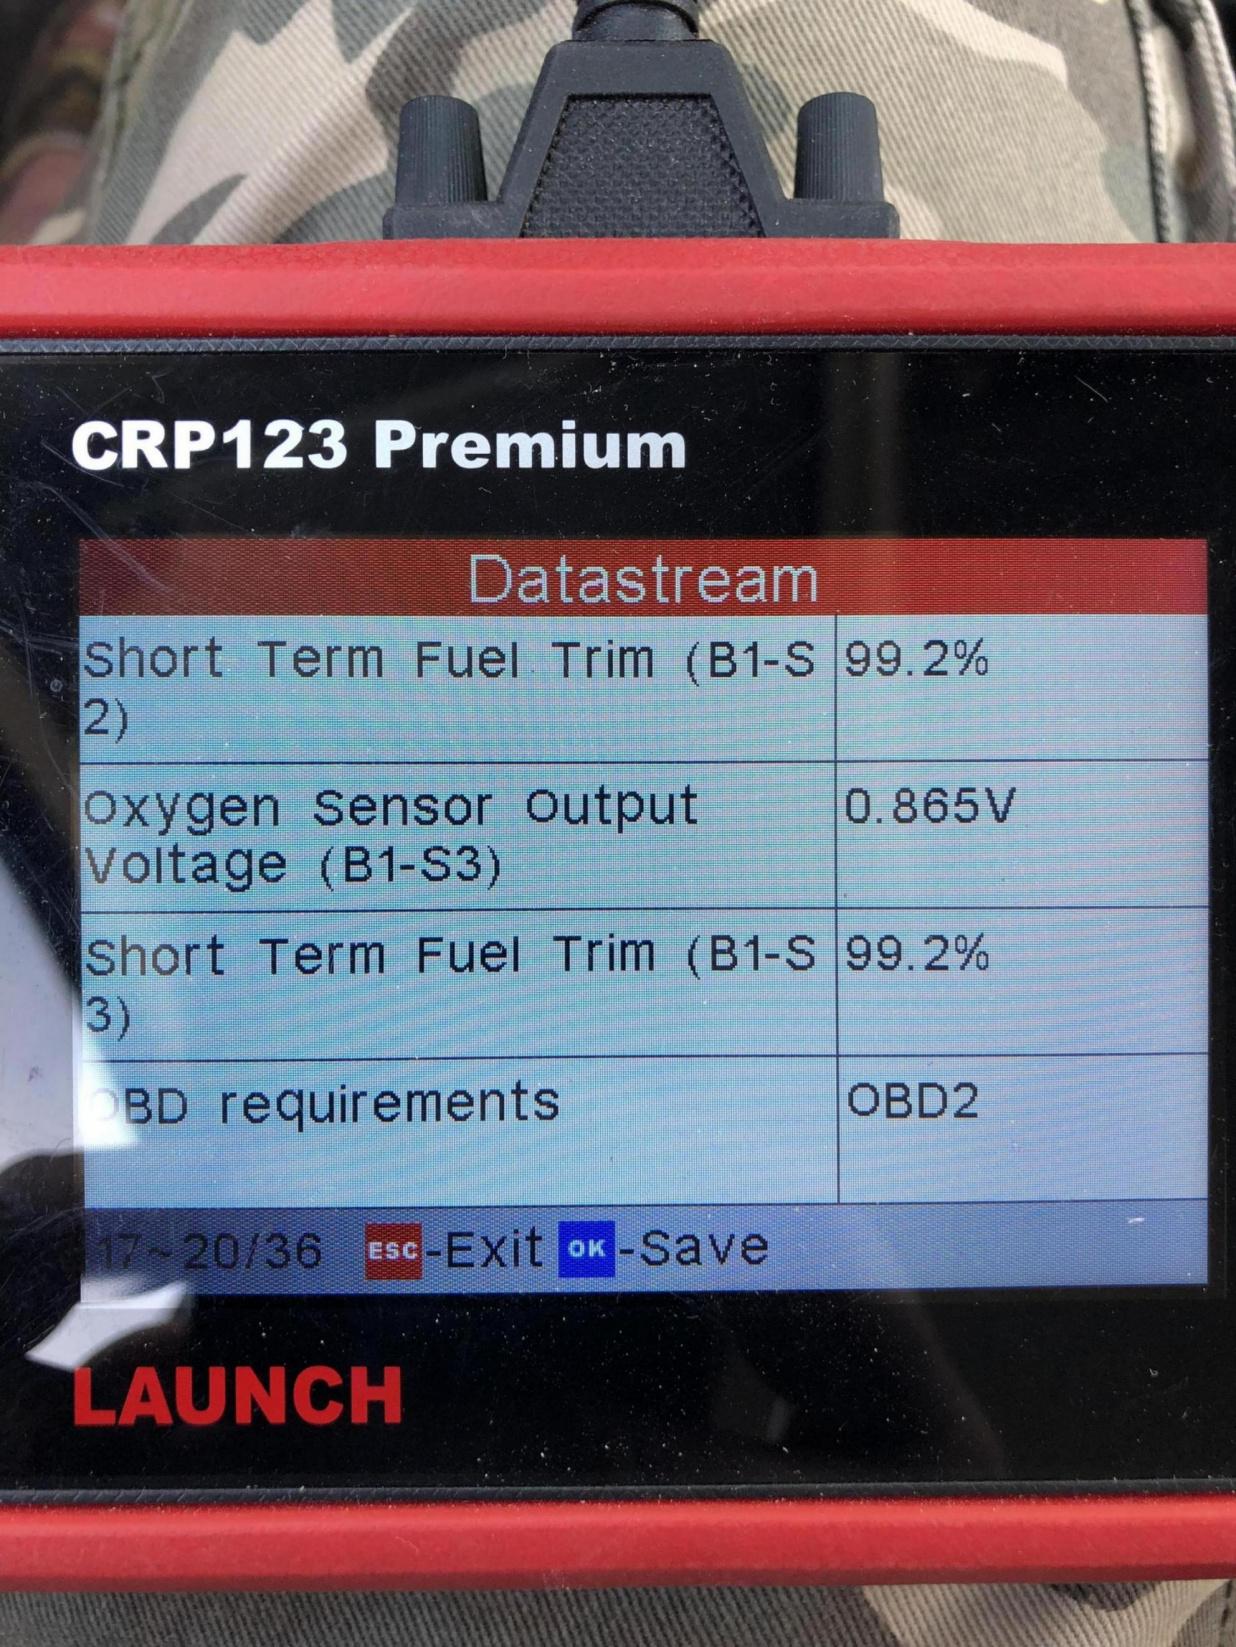 Code P0171 System too Lean. (not the PCV hose)-890c21b7-d545-4945-ab6c-6ee1257eeae2_1561676602423.jpg